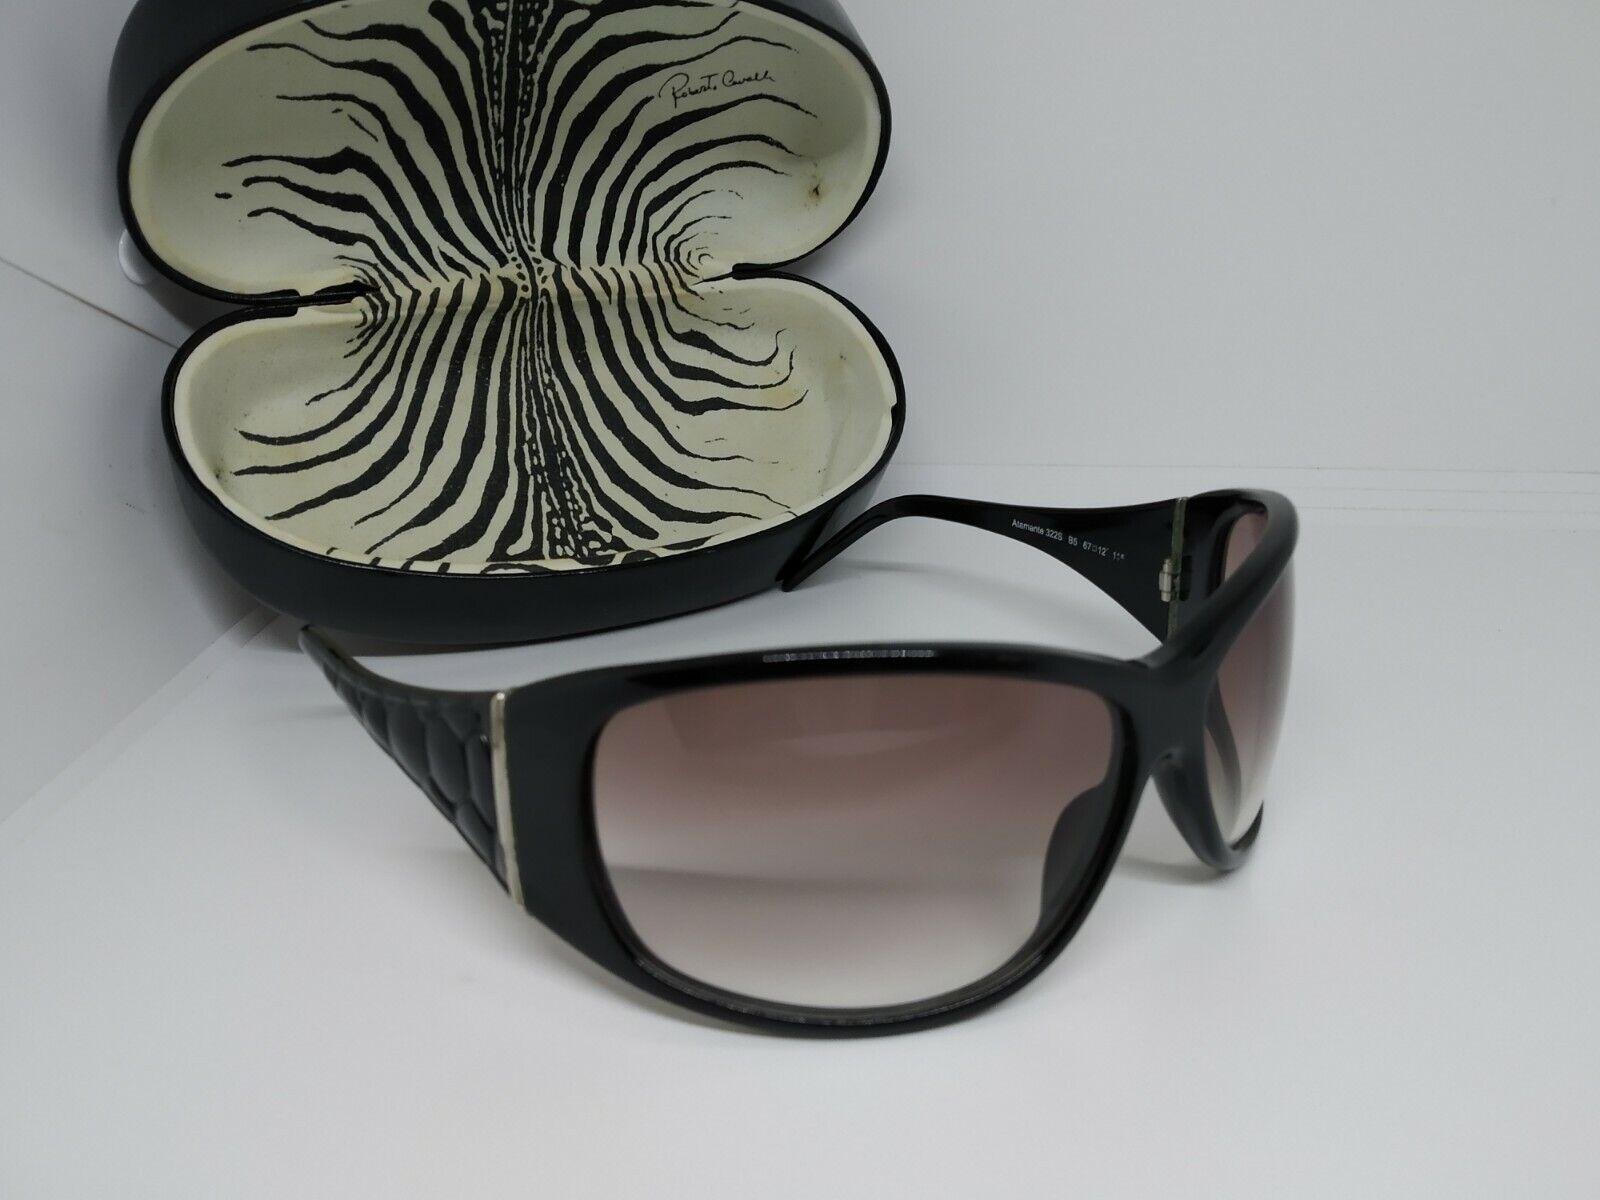 100% Authentic Roberto Cavalli Atamante 322S Oversized Wrap Women's Sunglasses